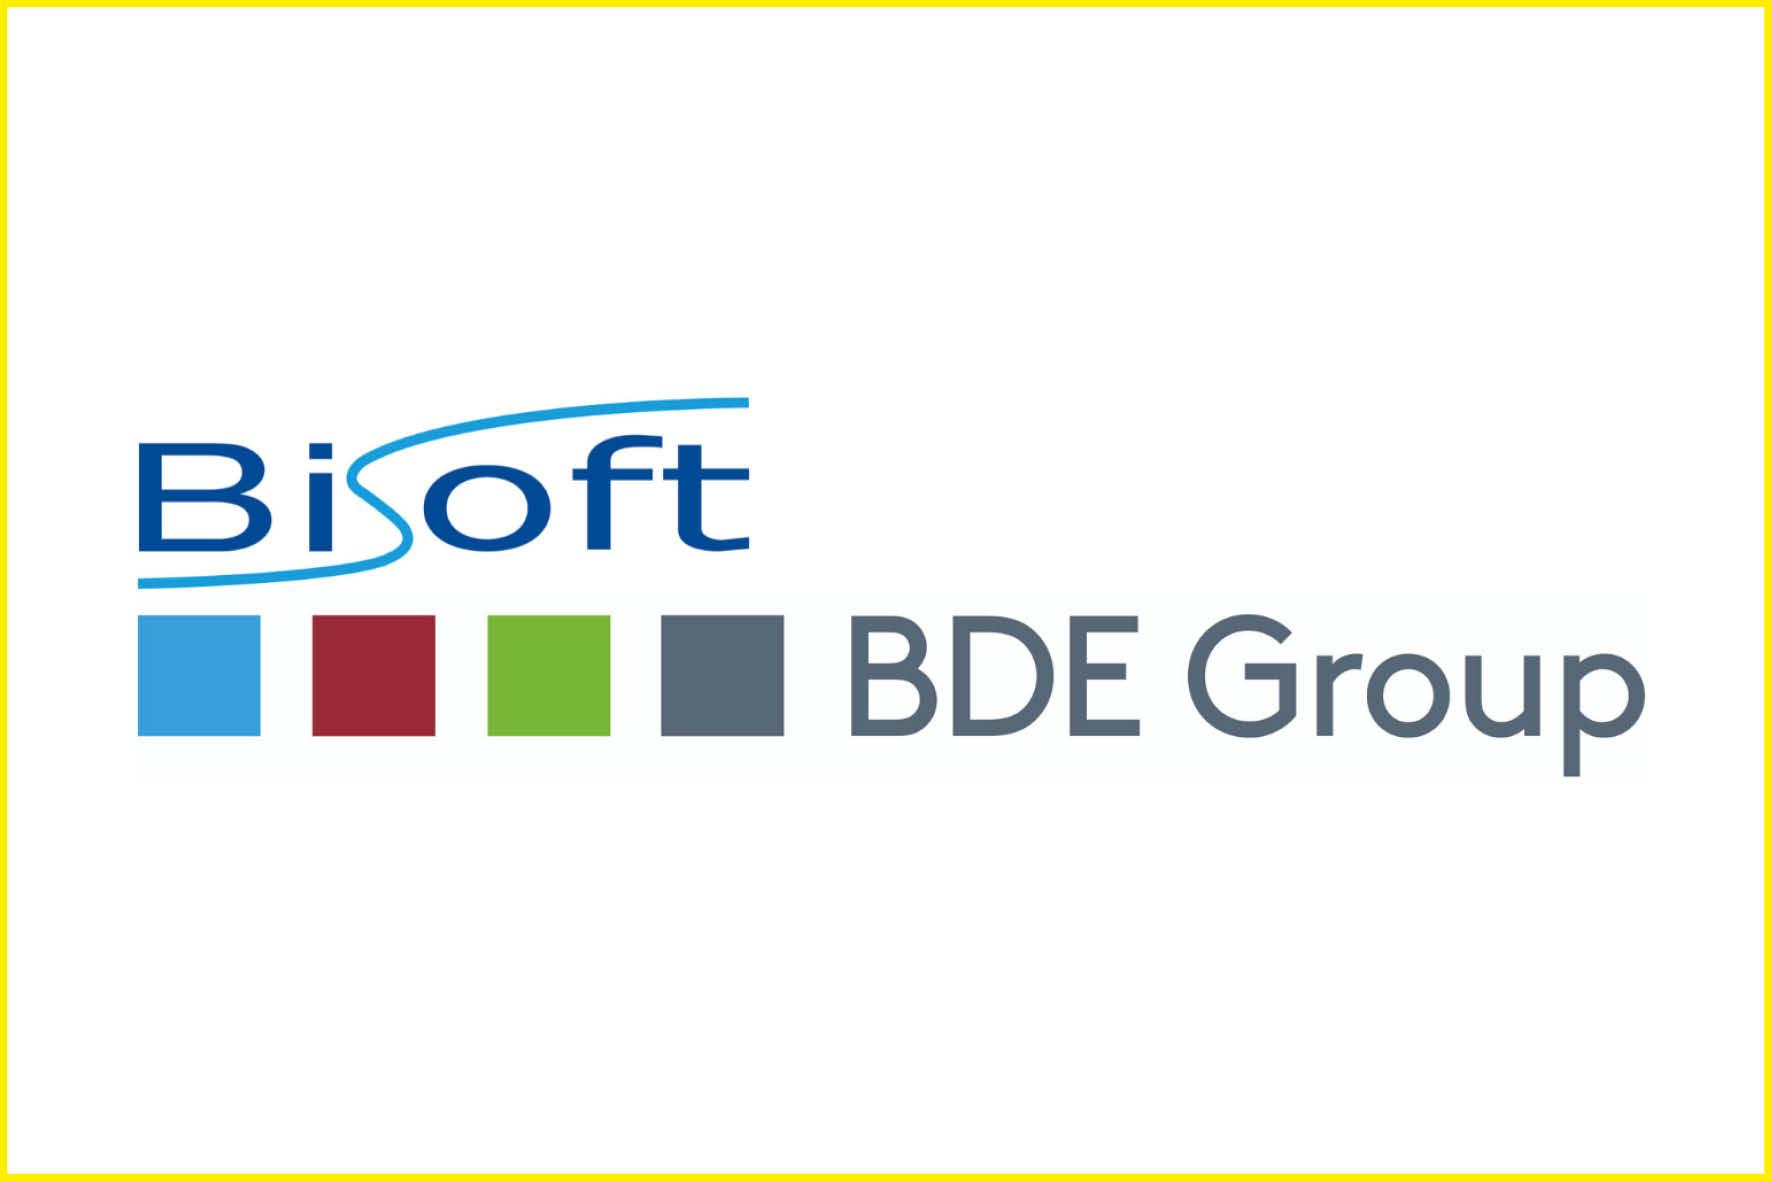 mark-com-event-Bisoft-bde-group